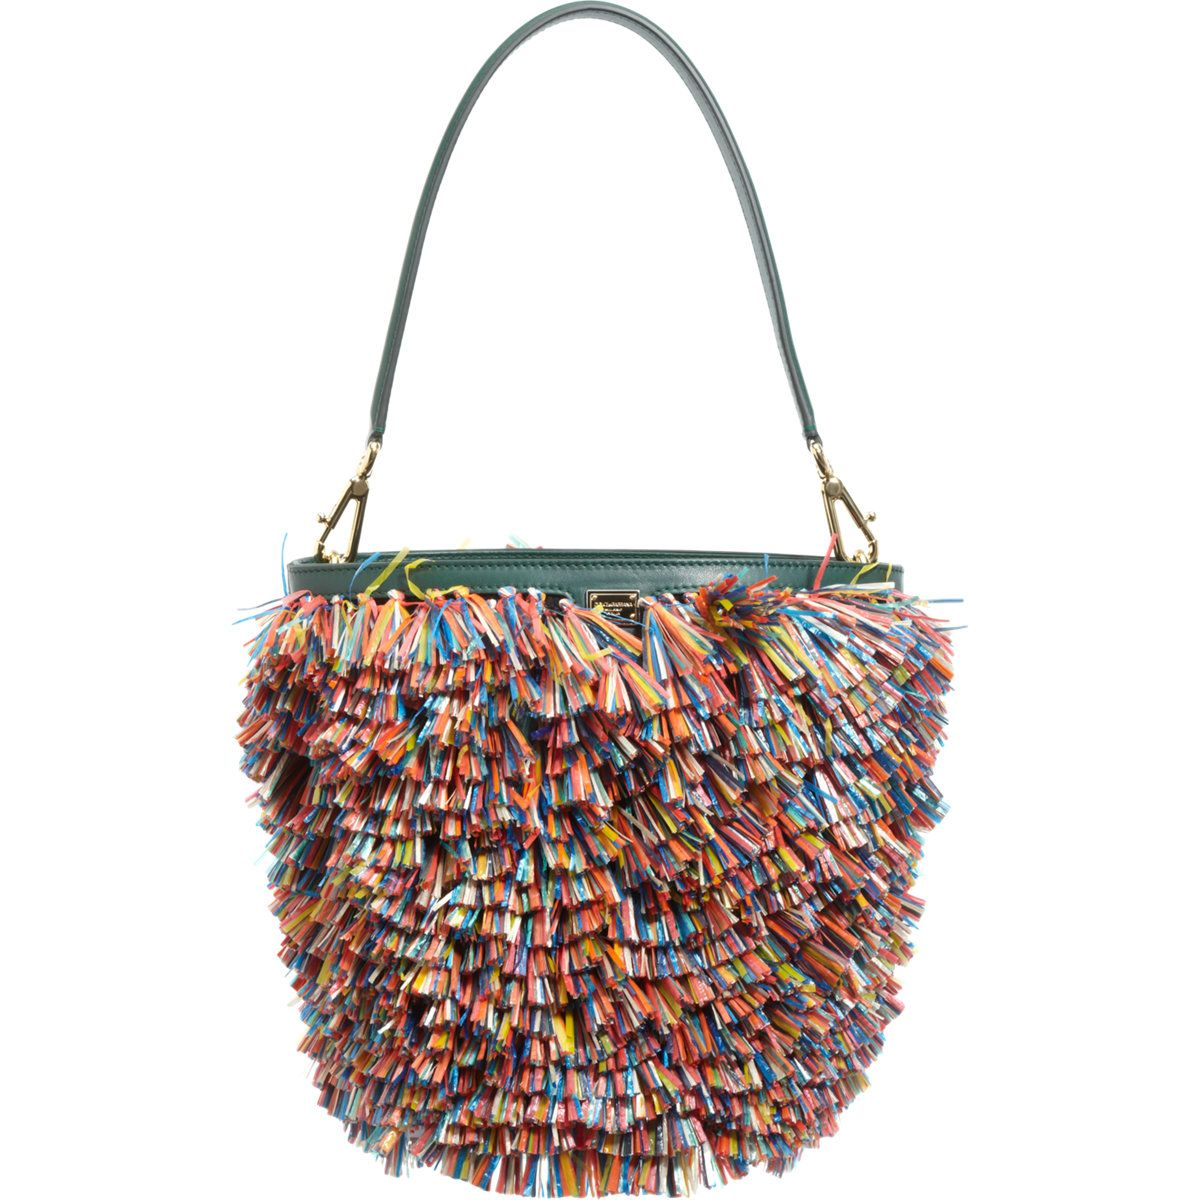 Dolce & Gabbana Small Fringed Miss Ingrid Bag at Barneys.com